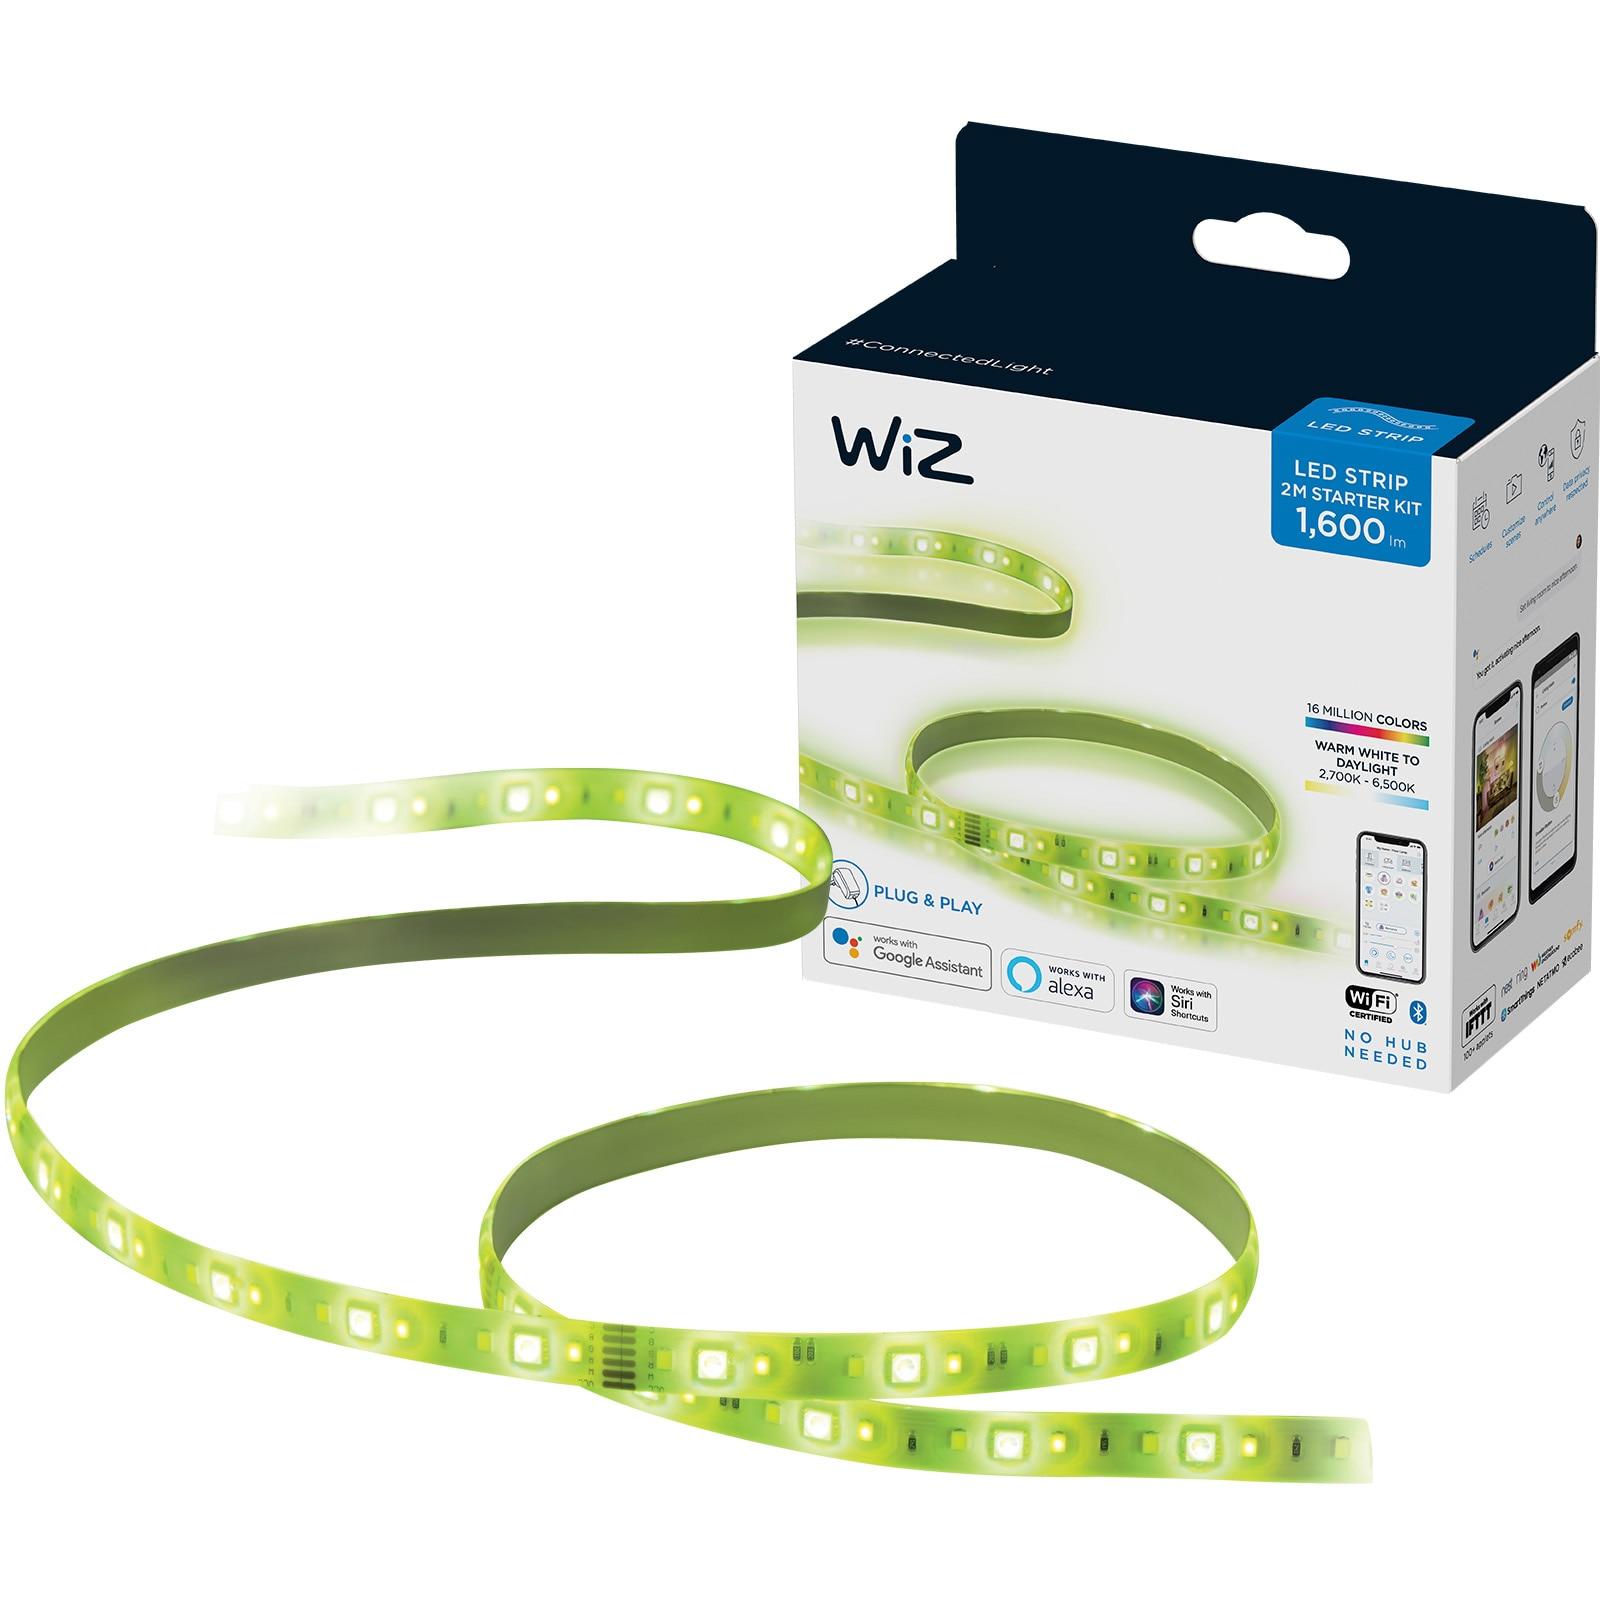 Fotografie Banda LED RGB inteligenta WiZ Connected Starter Kit, Wi-Fi, 20W, 1600 lm, lumina alba si colorata, compatibil Google Assistant/Alexa/Siri, 2 m